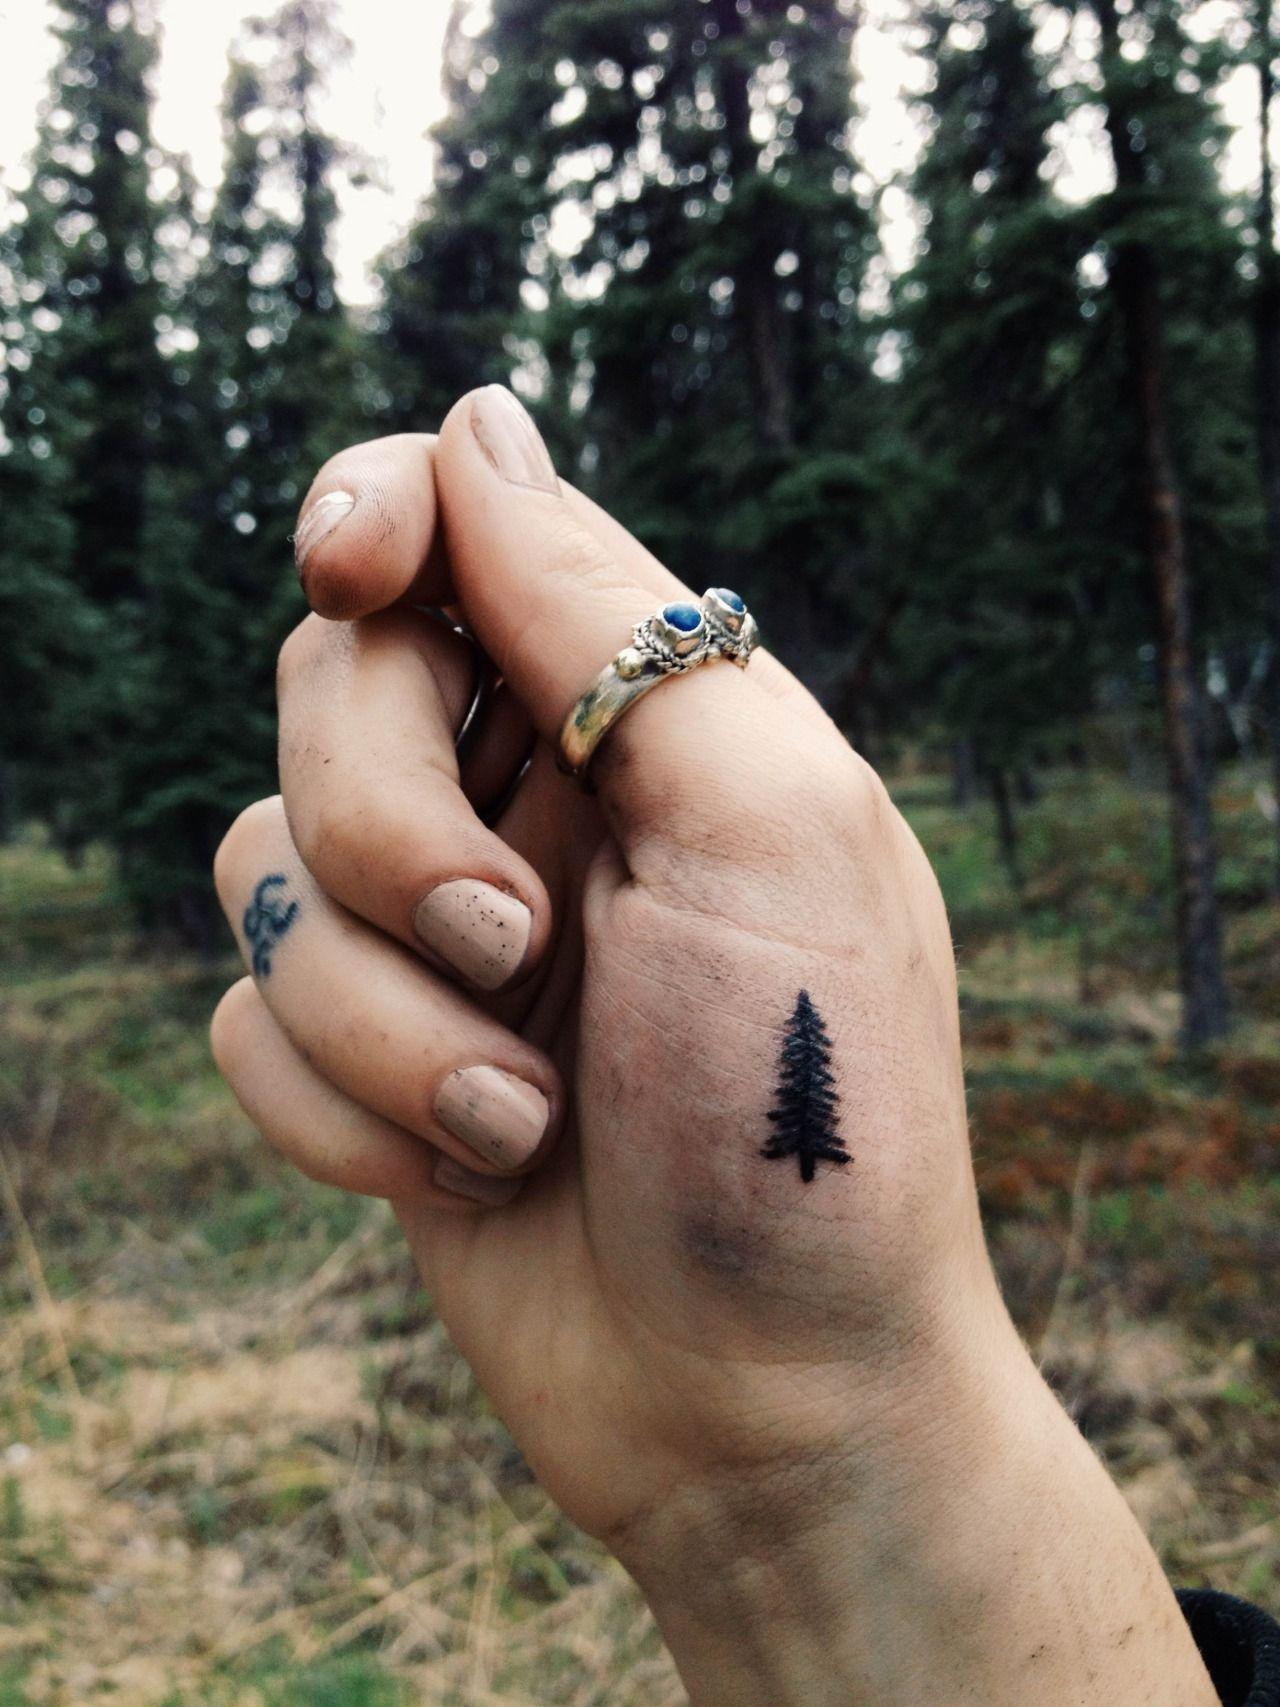 27ea67402 theengima-slc: Fresh and swollen. New pine tree tattoo I gave myself ...